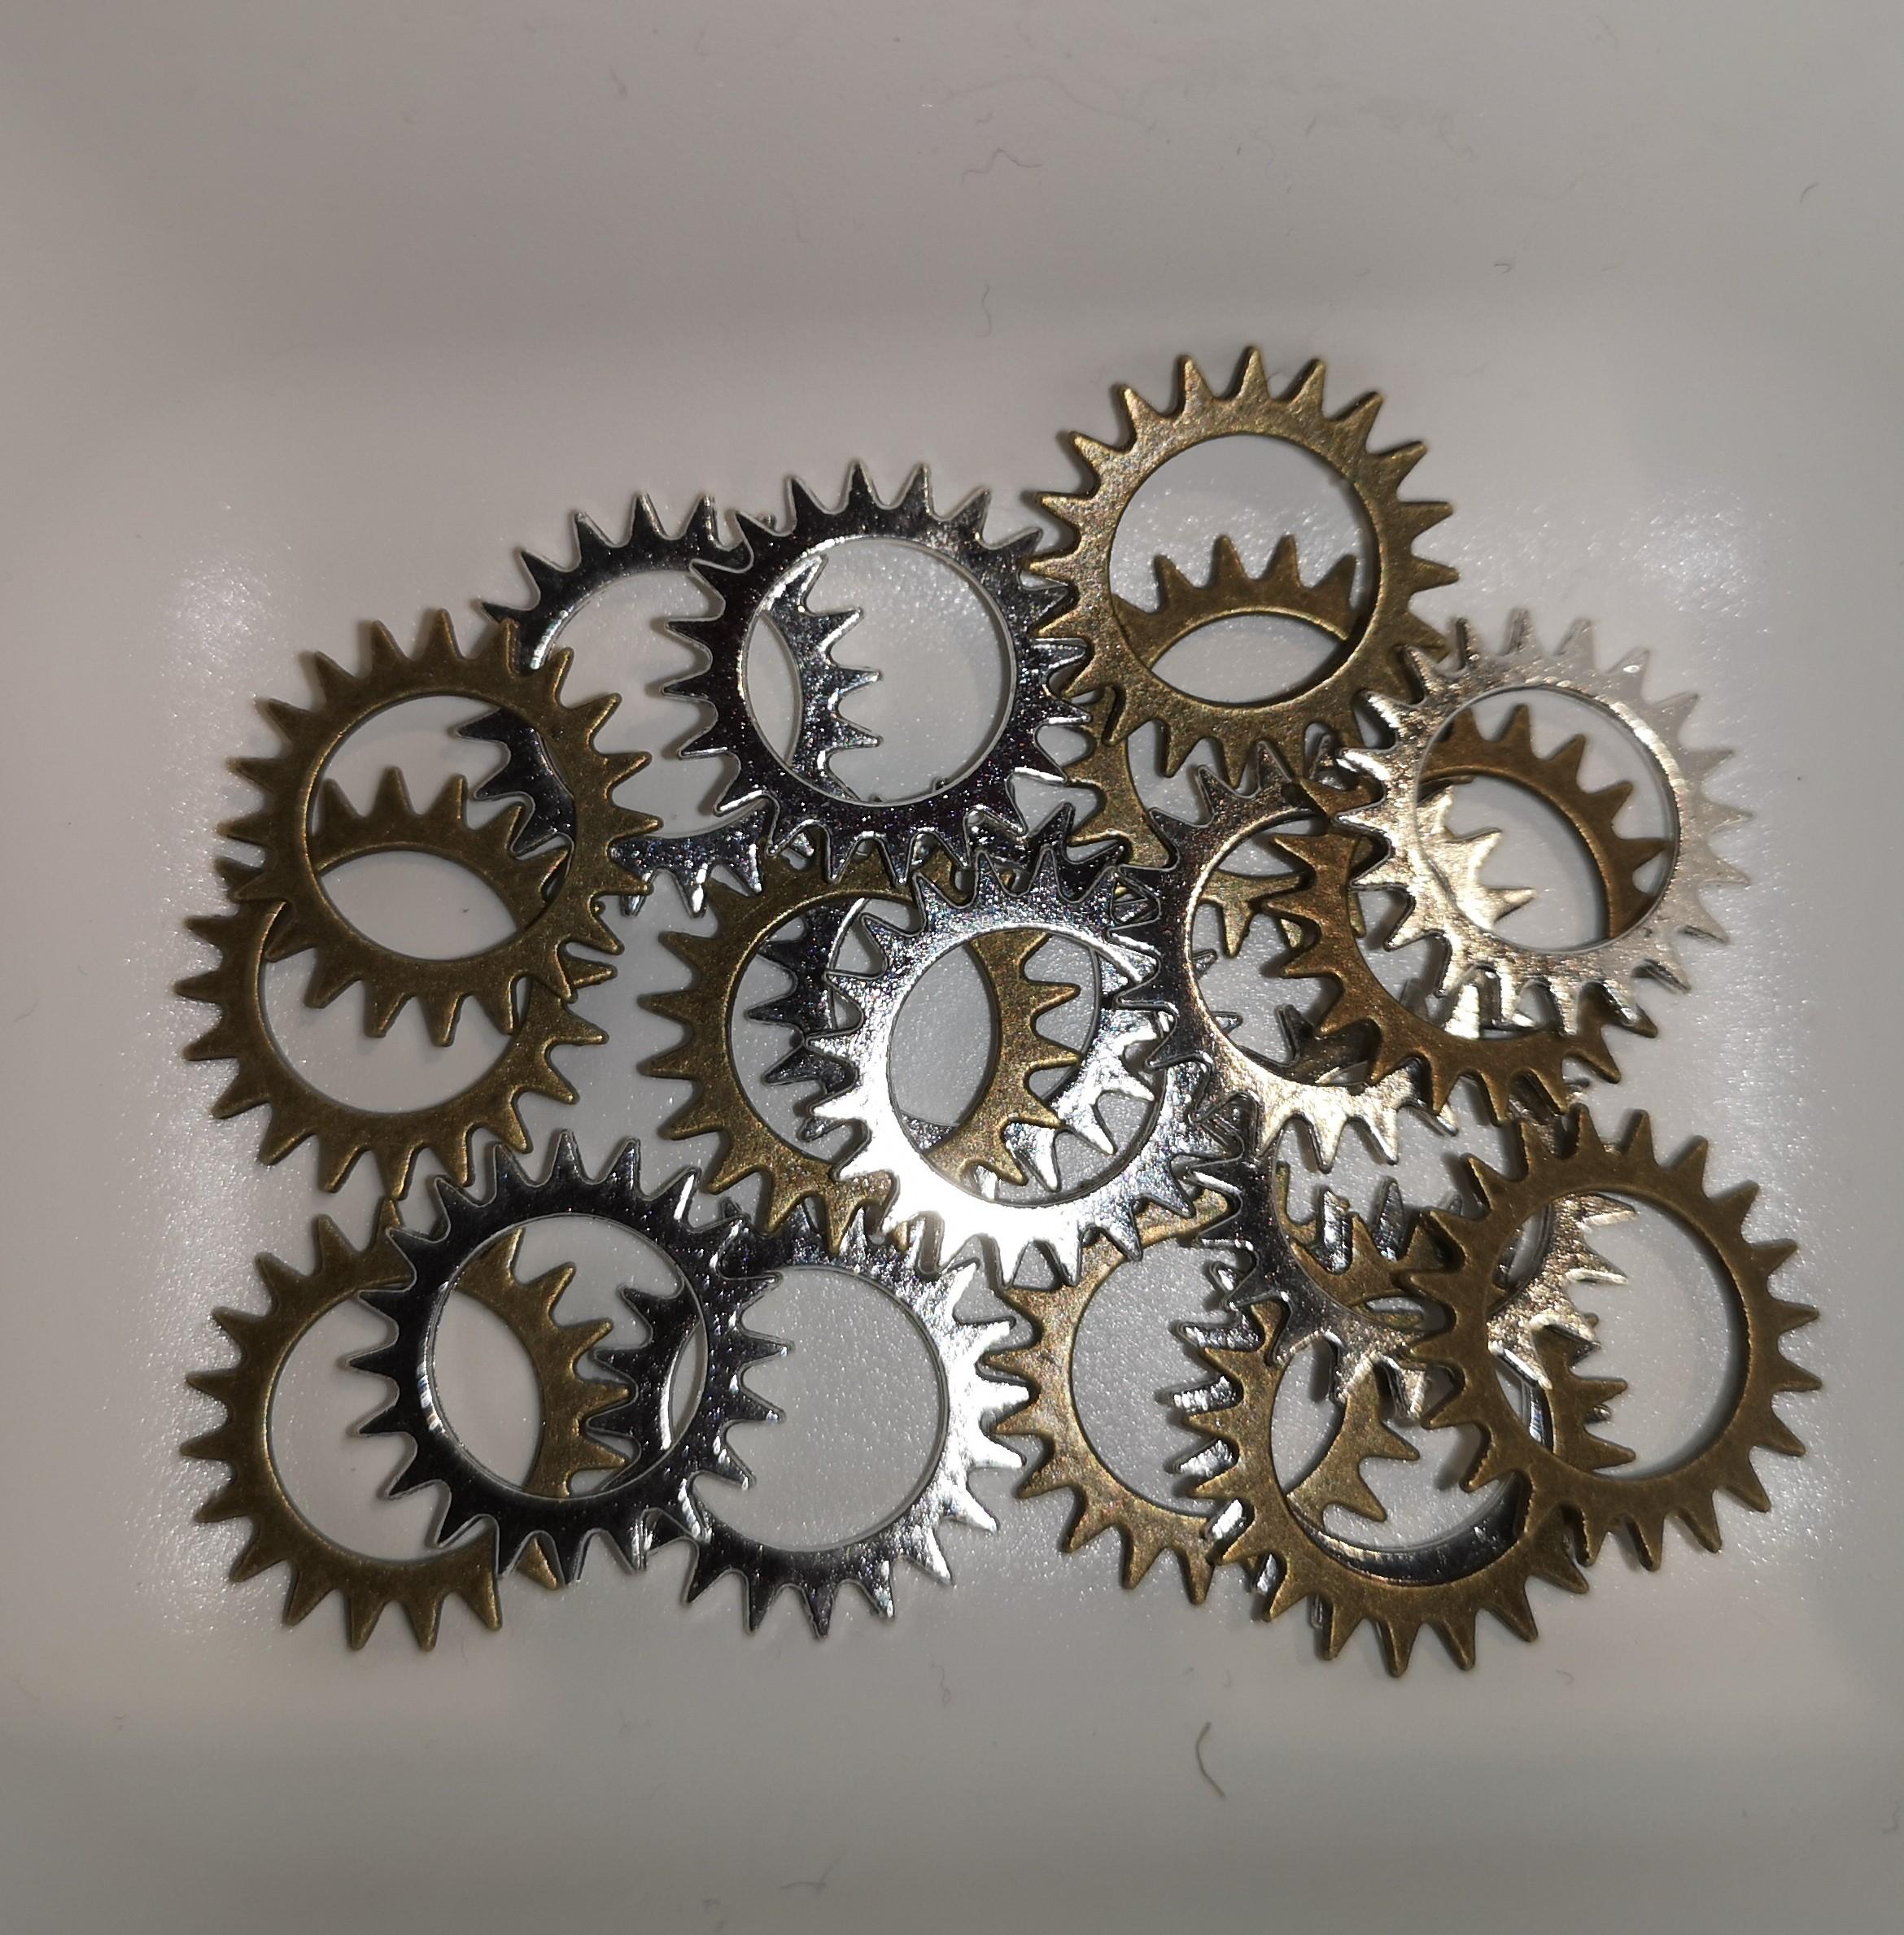 Charms - Gear sirkel 1,7cm blanding - pose 15 stk